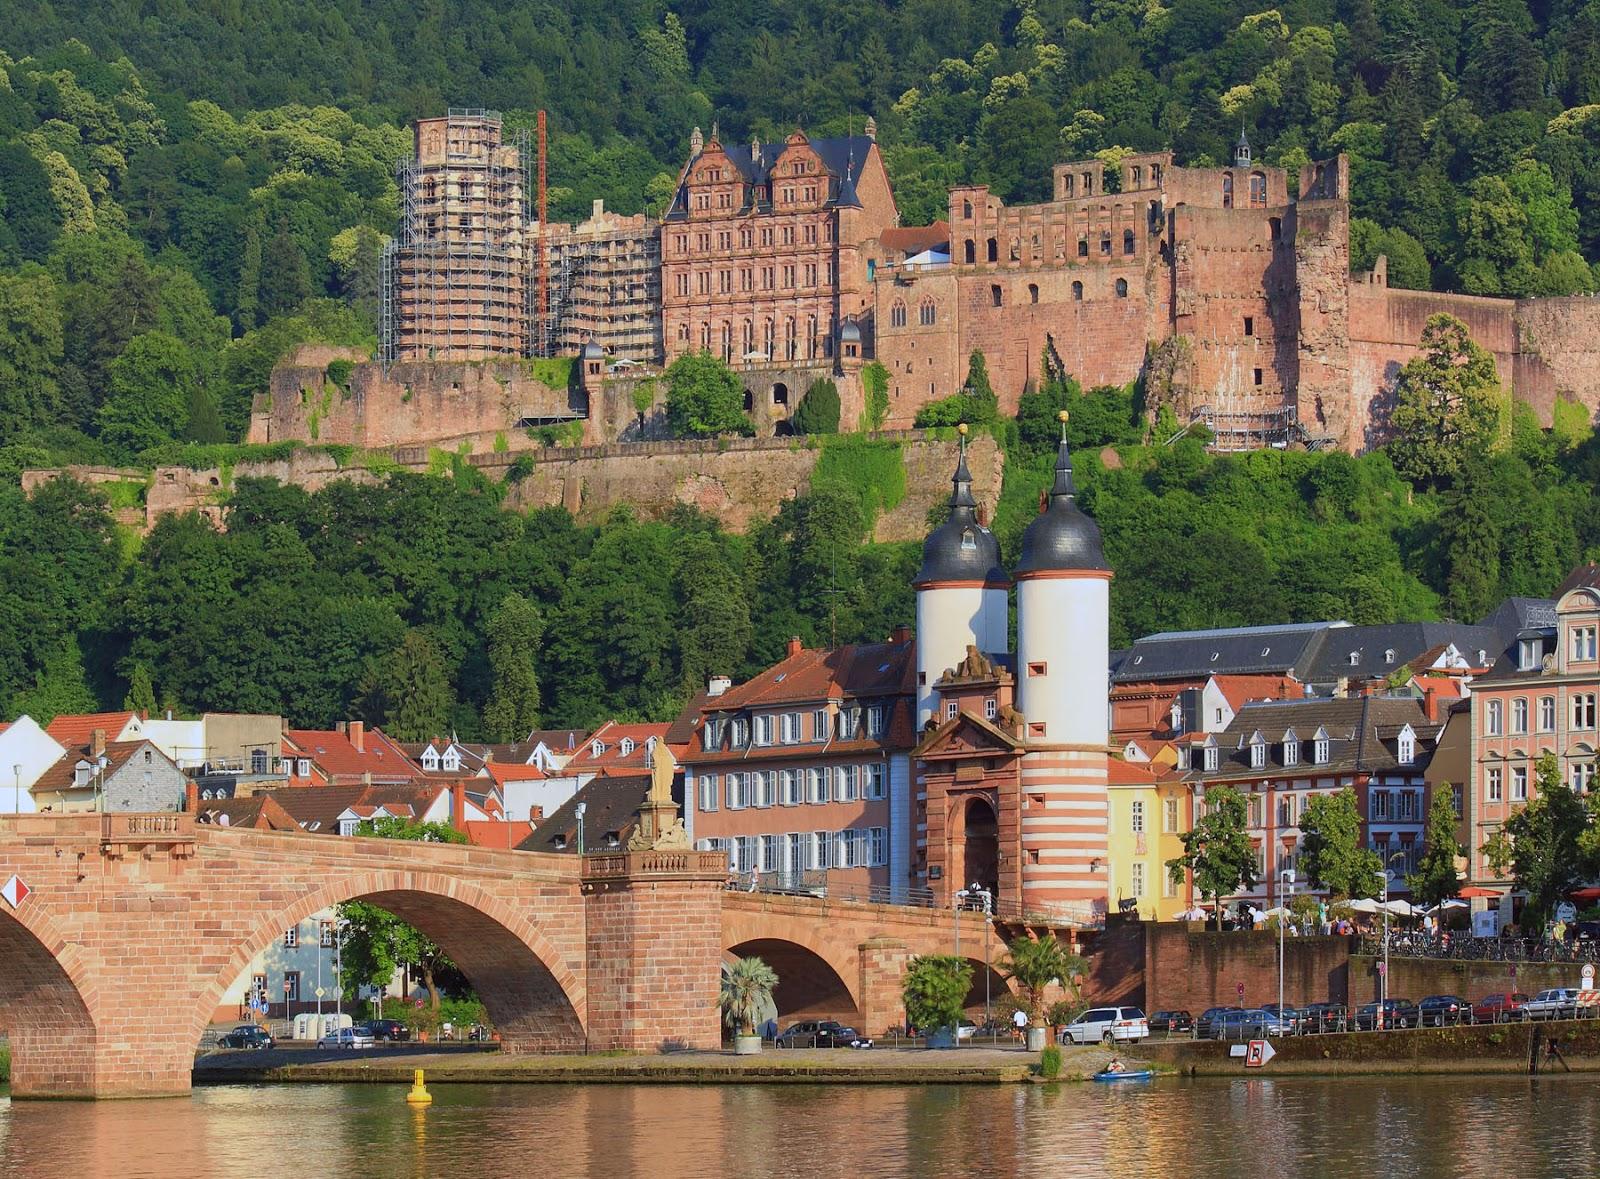 Heidelberg Chateau Restaurant